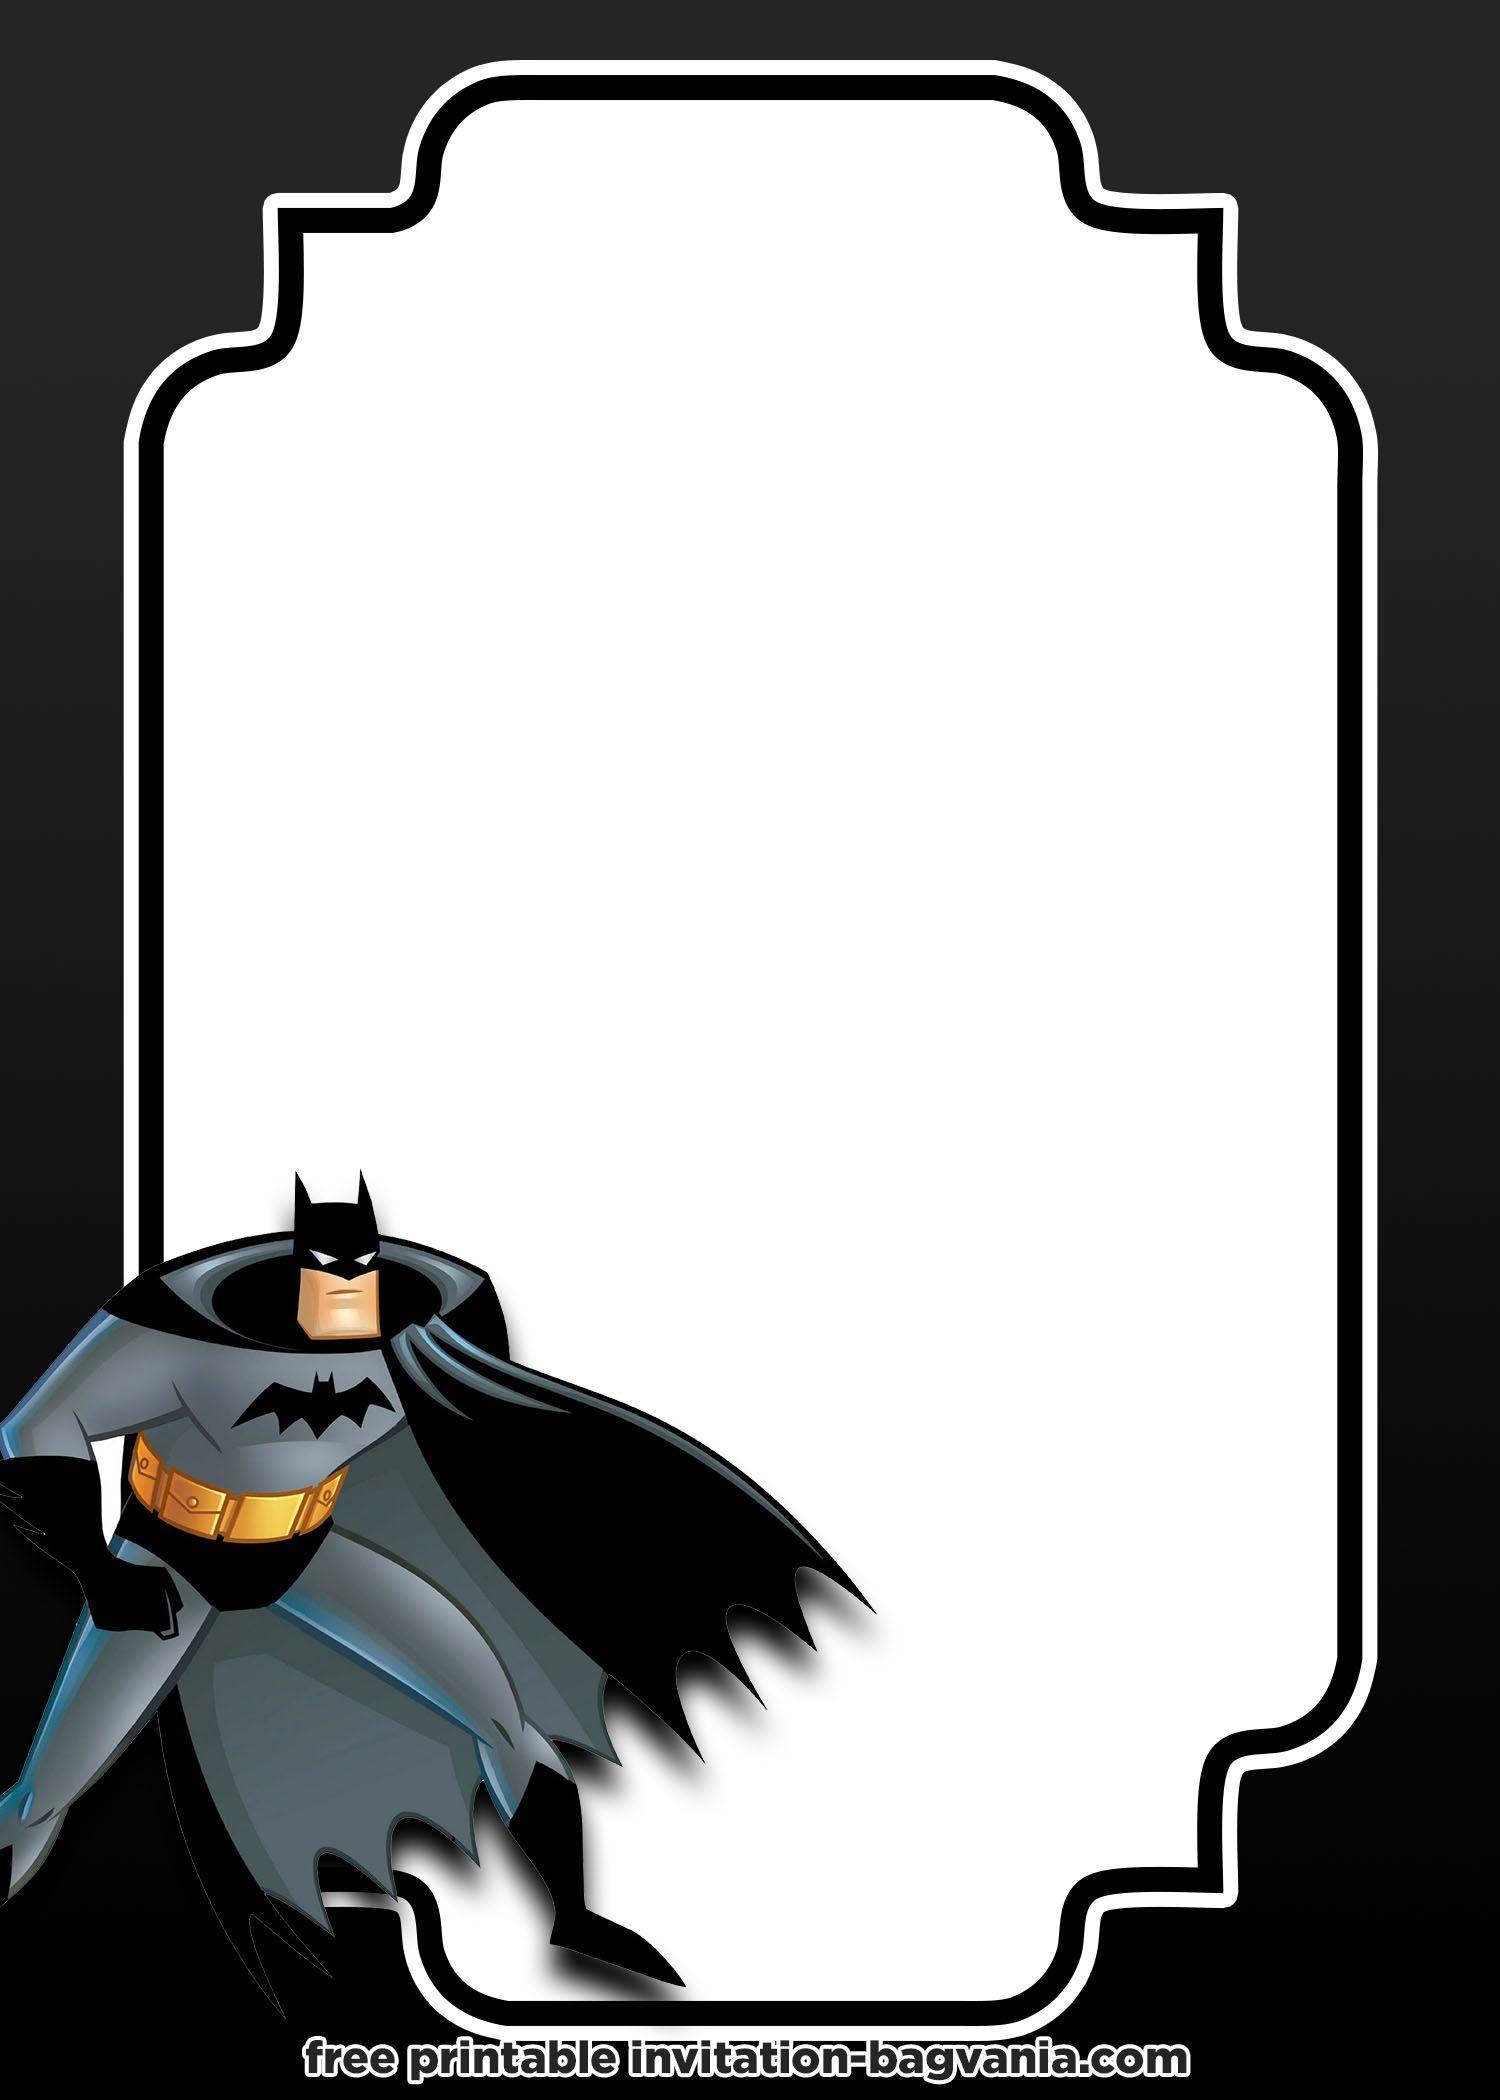 Free Printable Batman Invitation Templates Batman Invitations Batman Birthday Invitations Batman Invitation Template